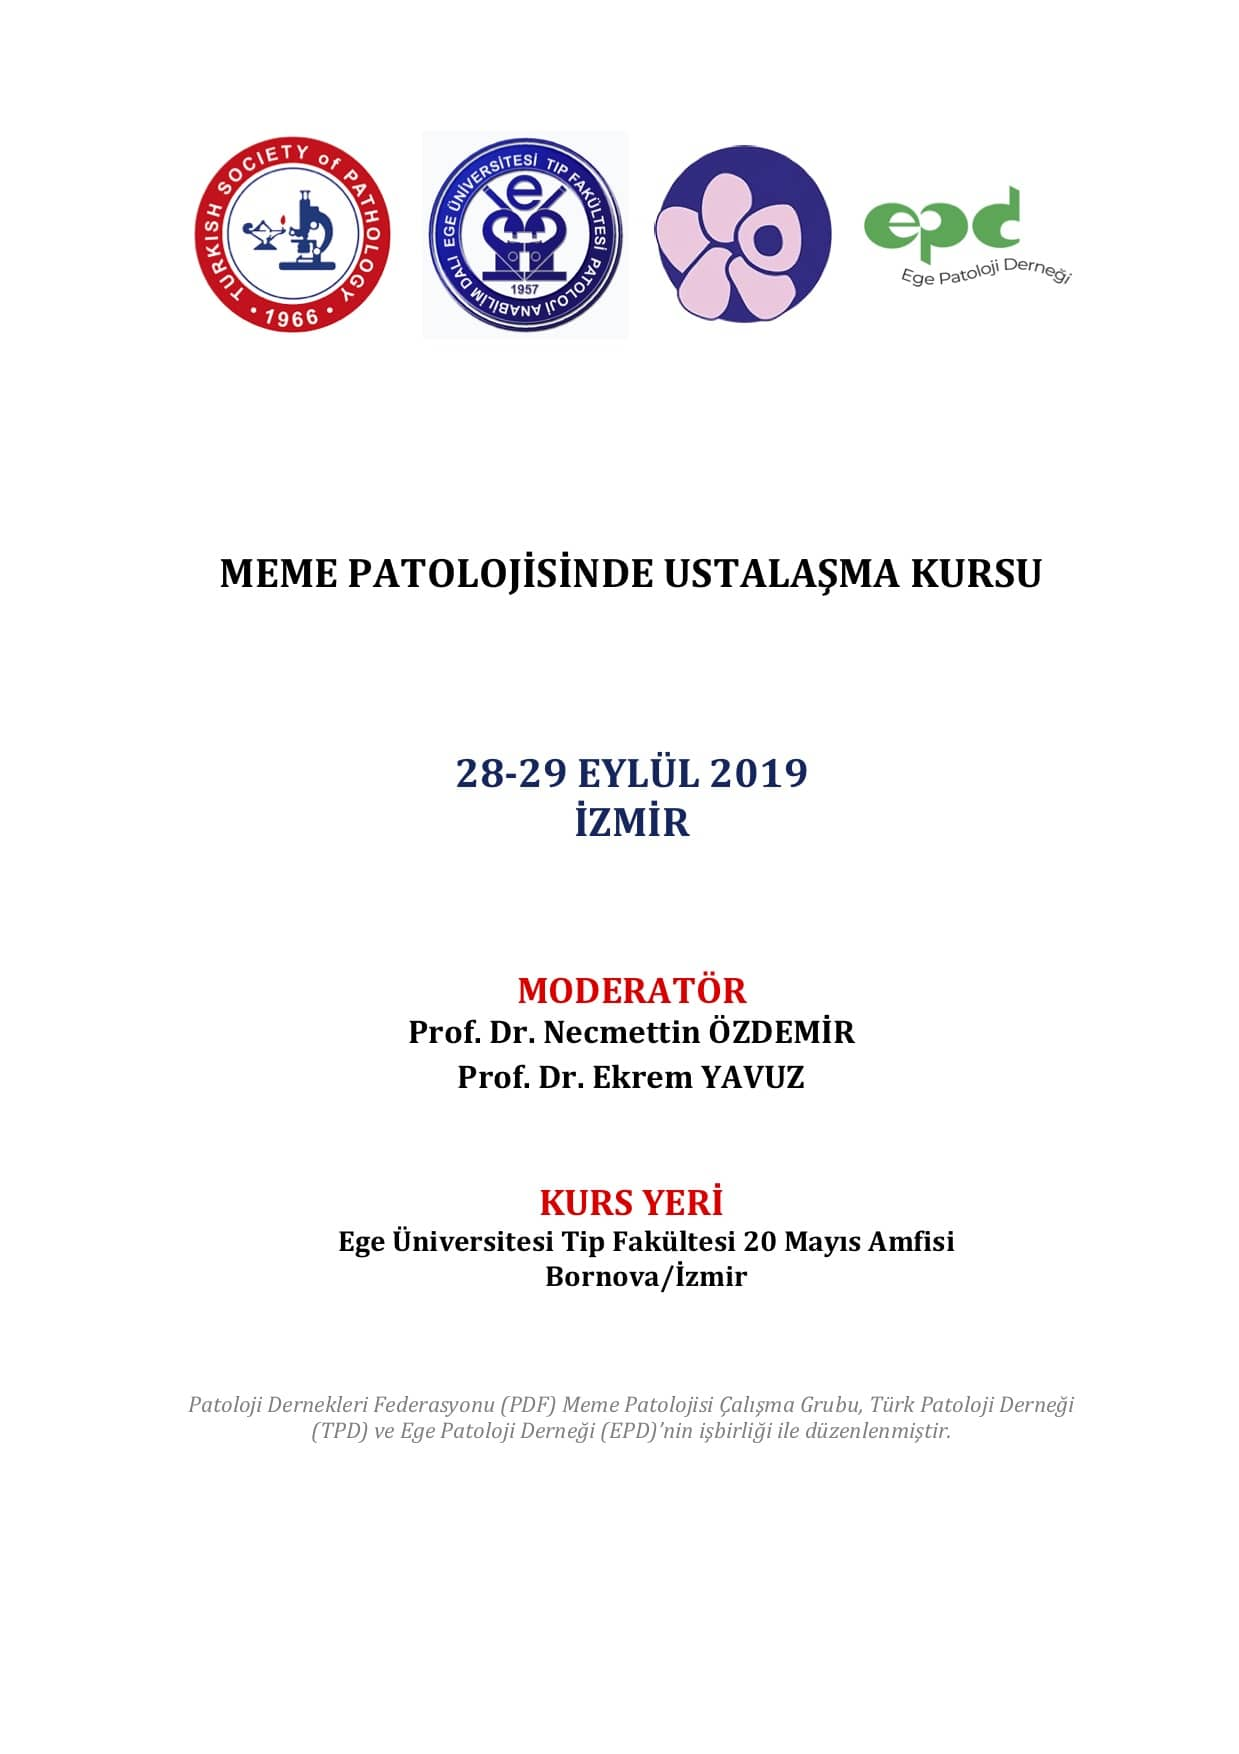 Meme Sempozyum 27-29 eylül 2019